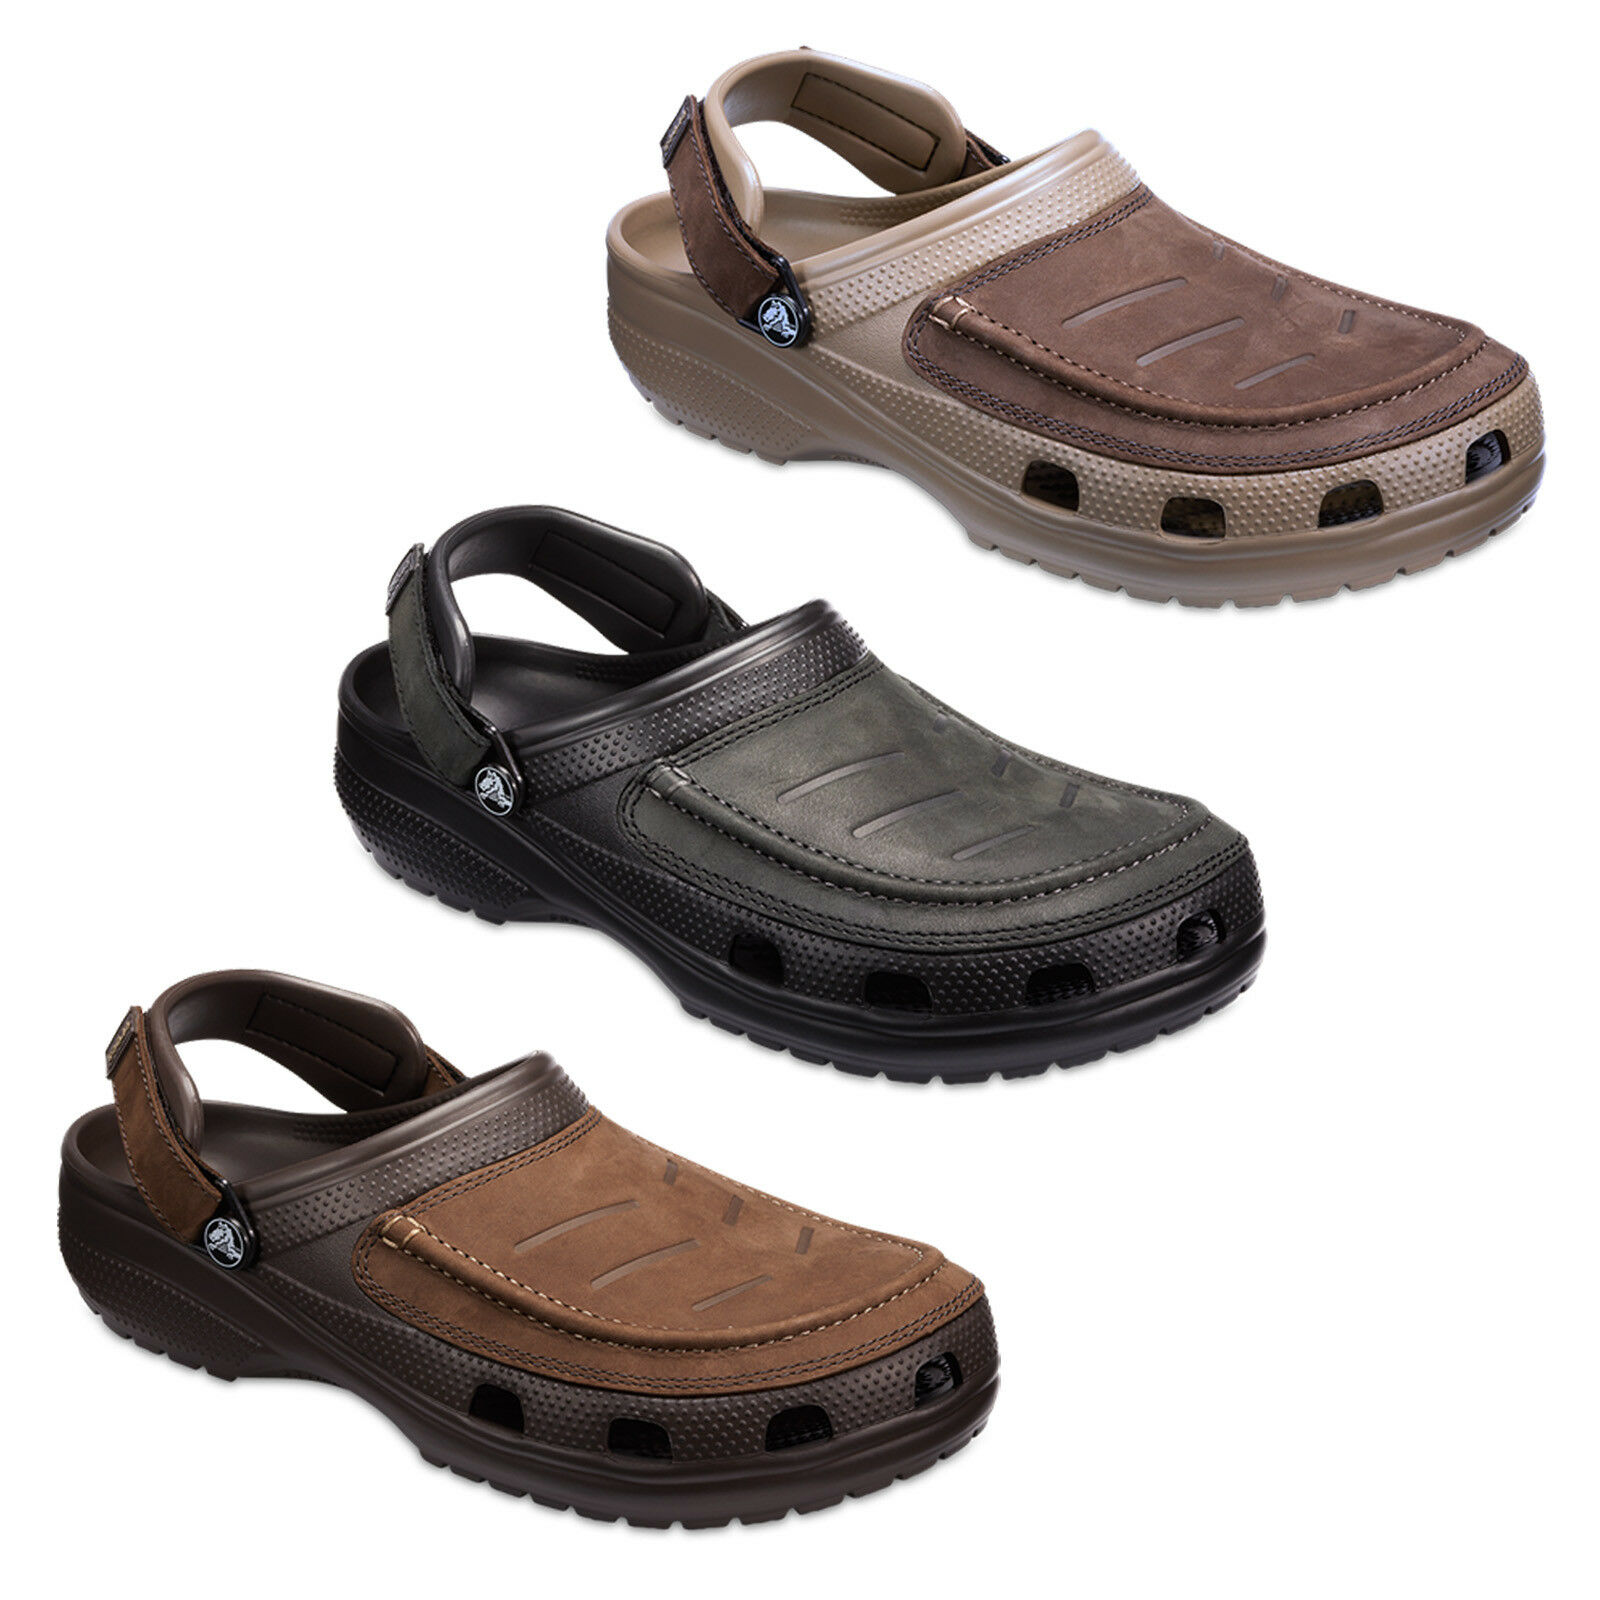 fe6490e22e97 Crocs Yukon Vista Clog Walking Comfort Leather Mens Sandals Shoes UK 7-12